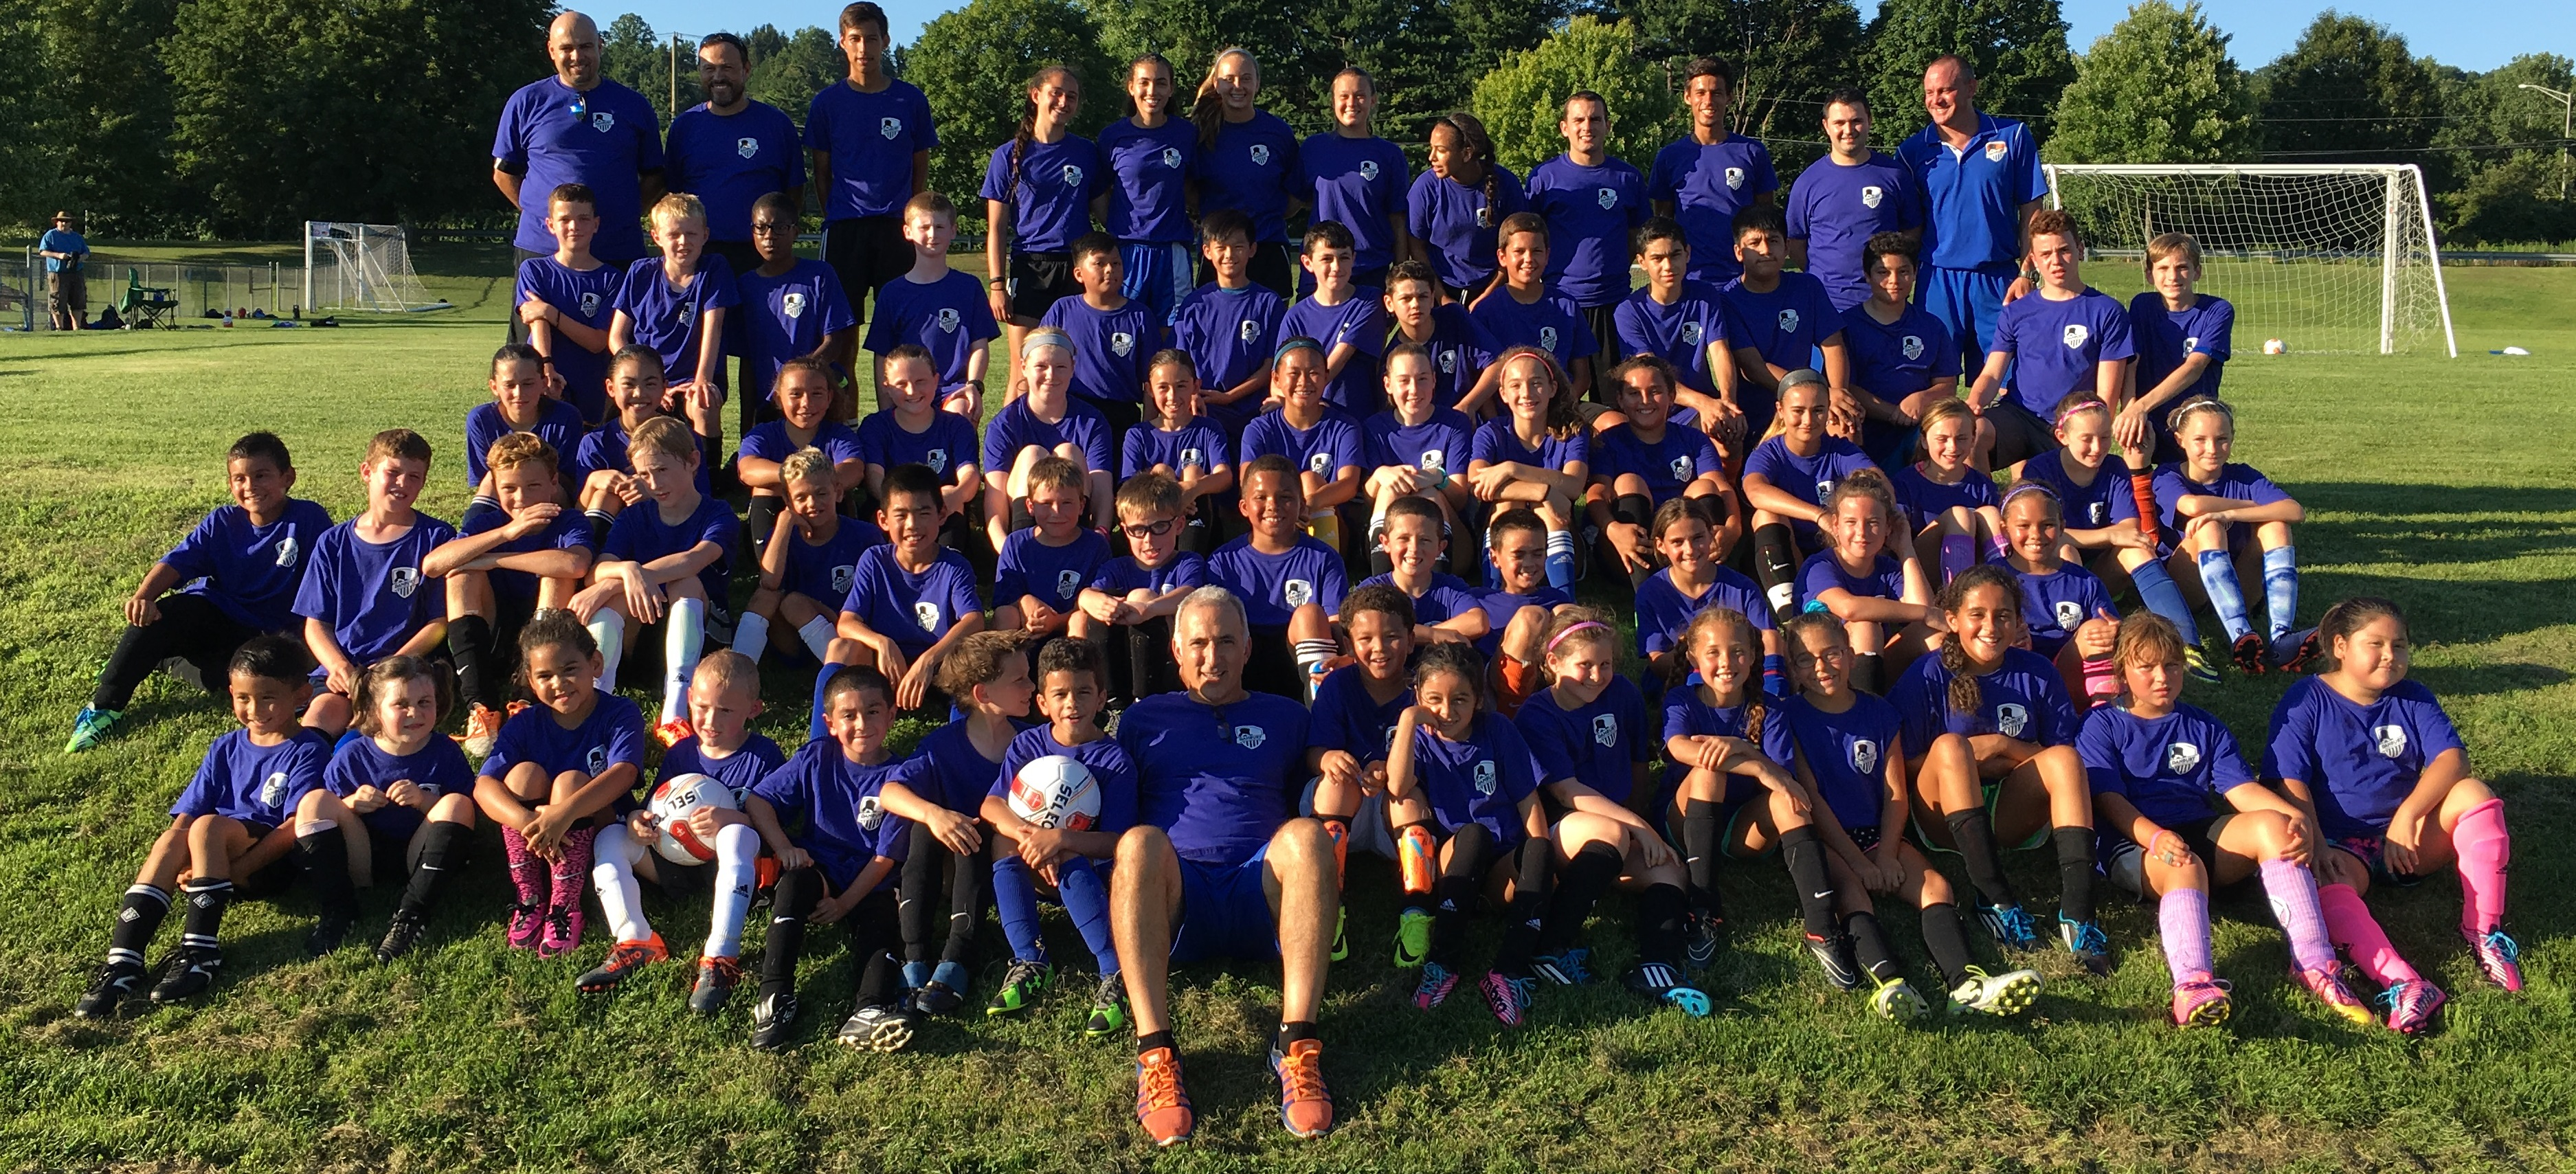 Soccer Camps Summer 2018 Danbury Youth Soccer Club